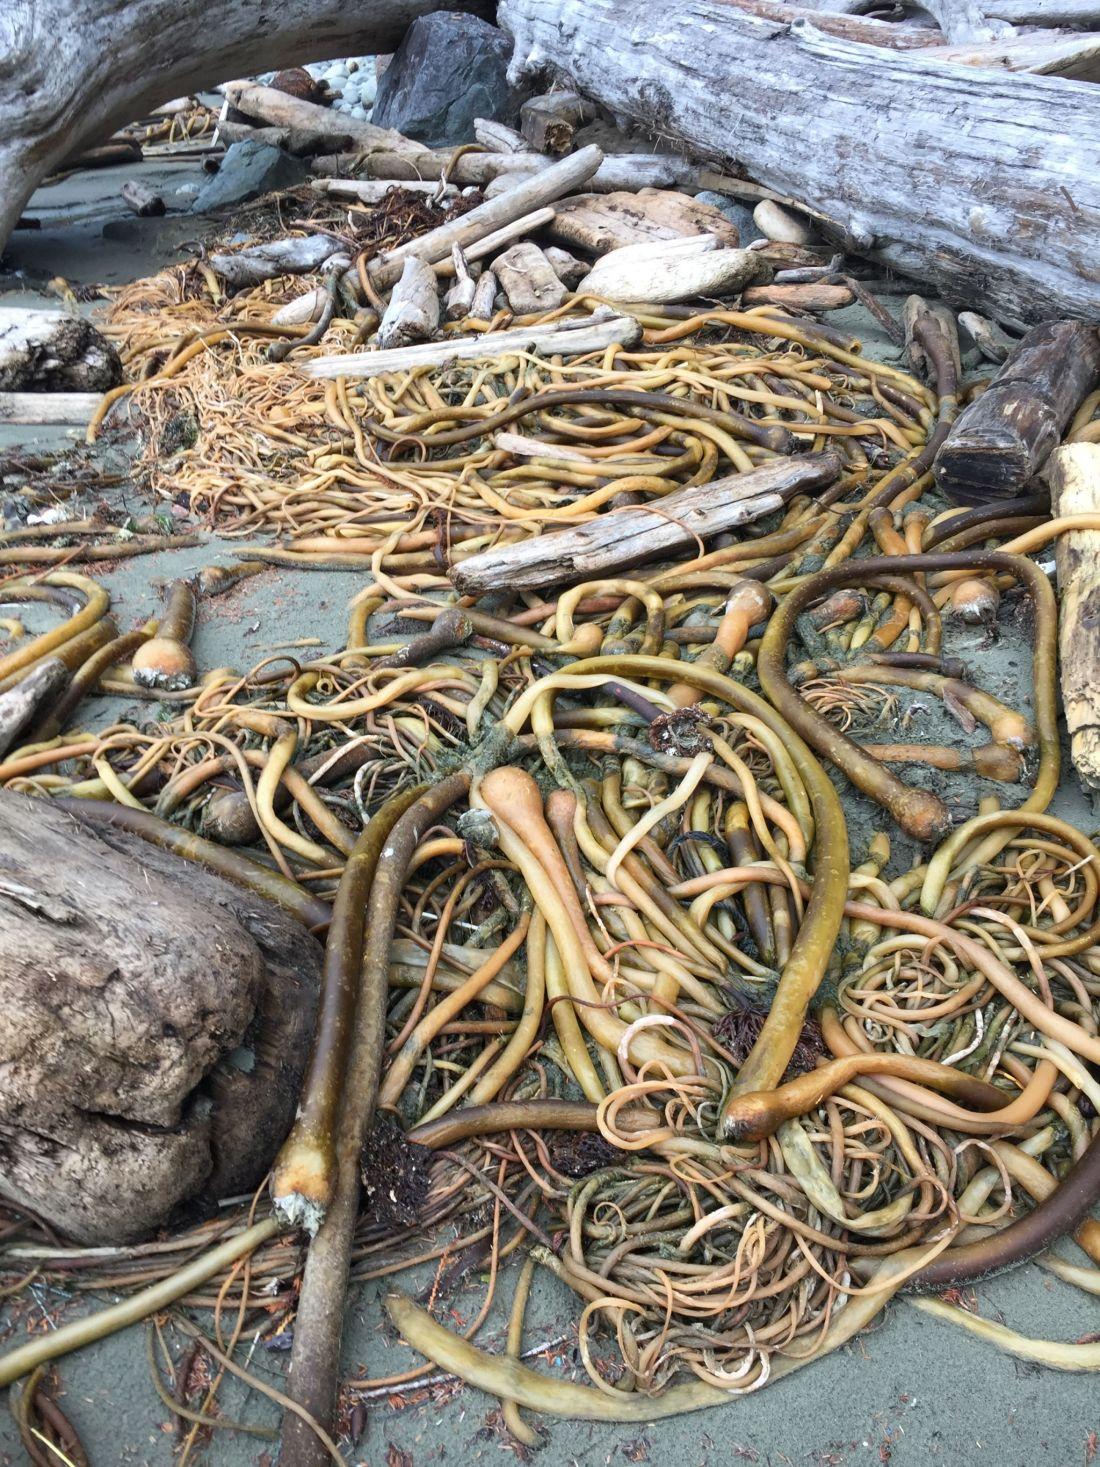 Seaweed at Pacific Rim National Park